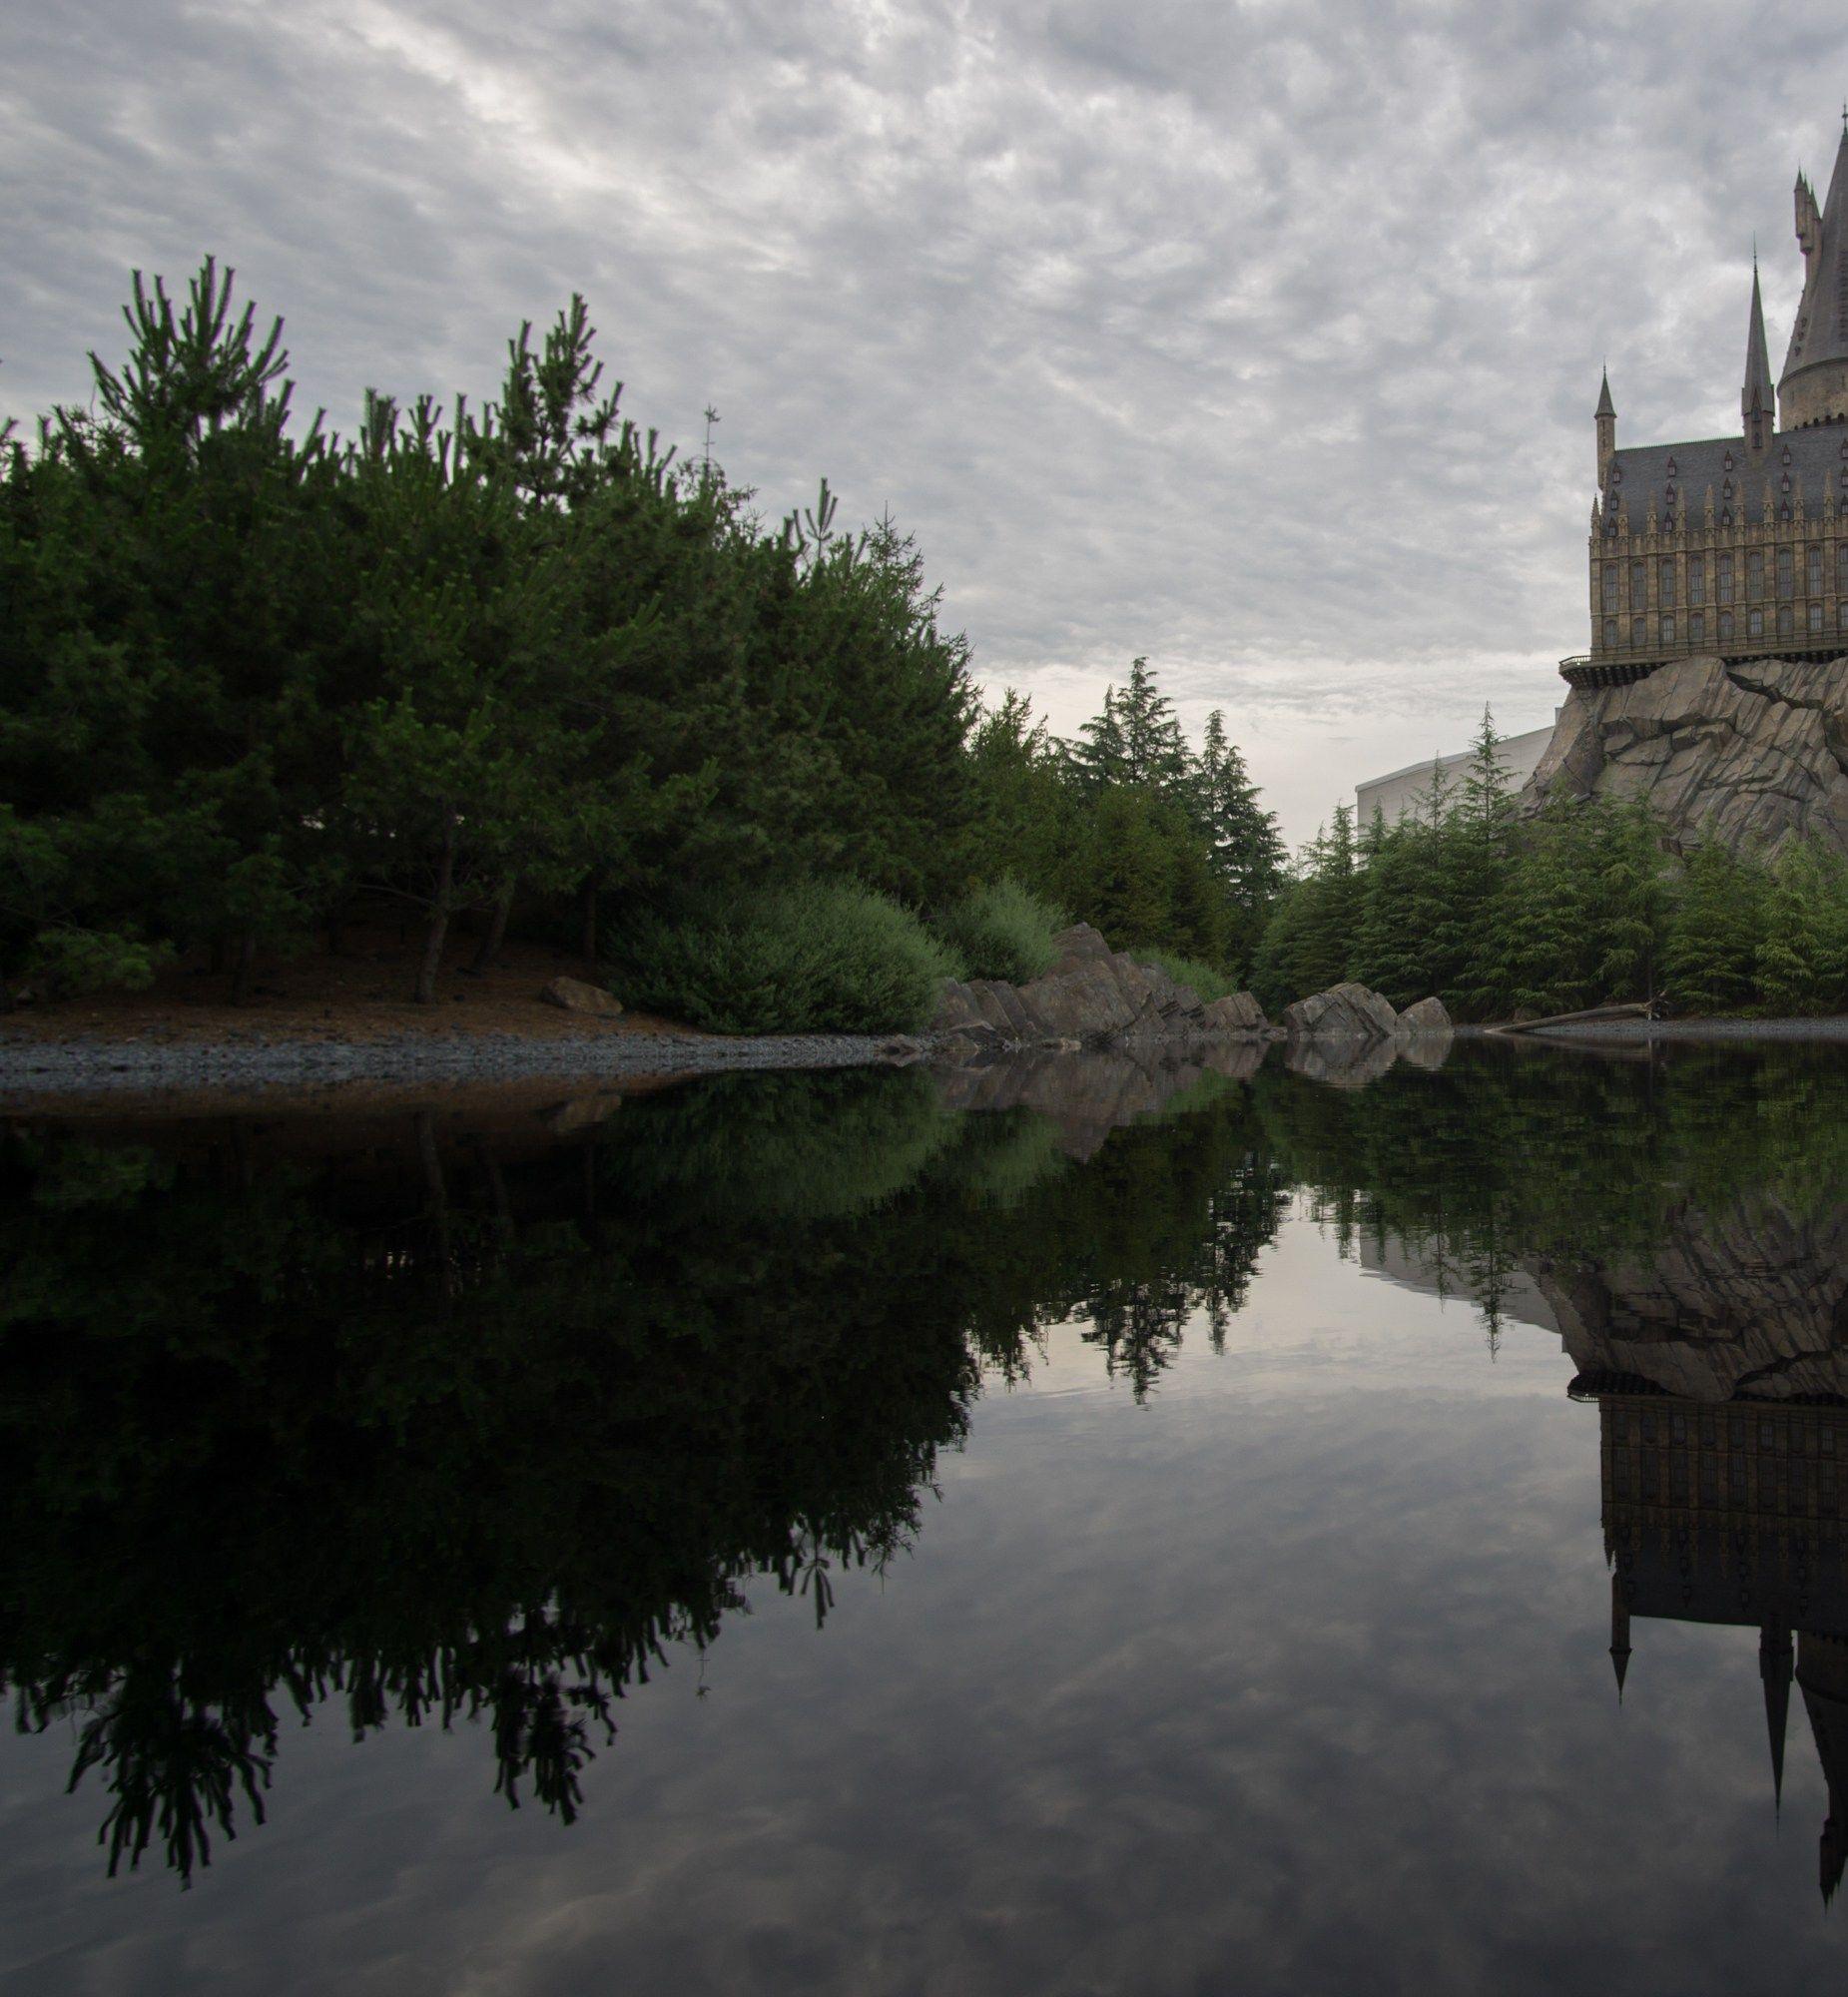 Black Lake Hogwarts Universal Studios Japan Harry Potter Hogwarts Universal Studios Universal Studios Japan Harry Potter Universal